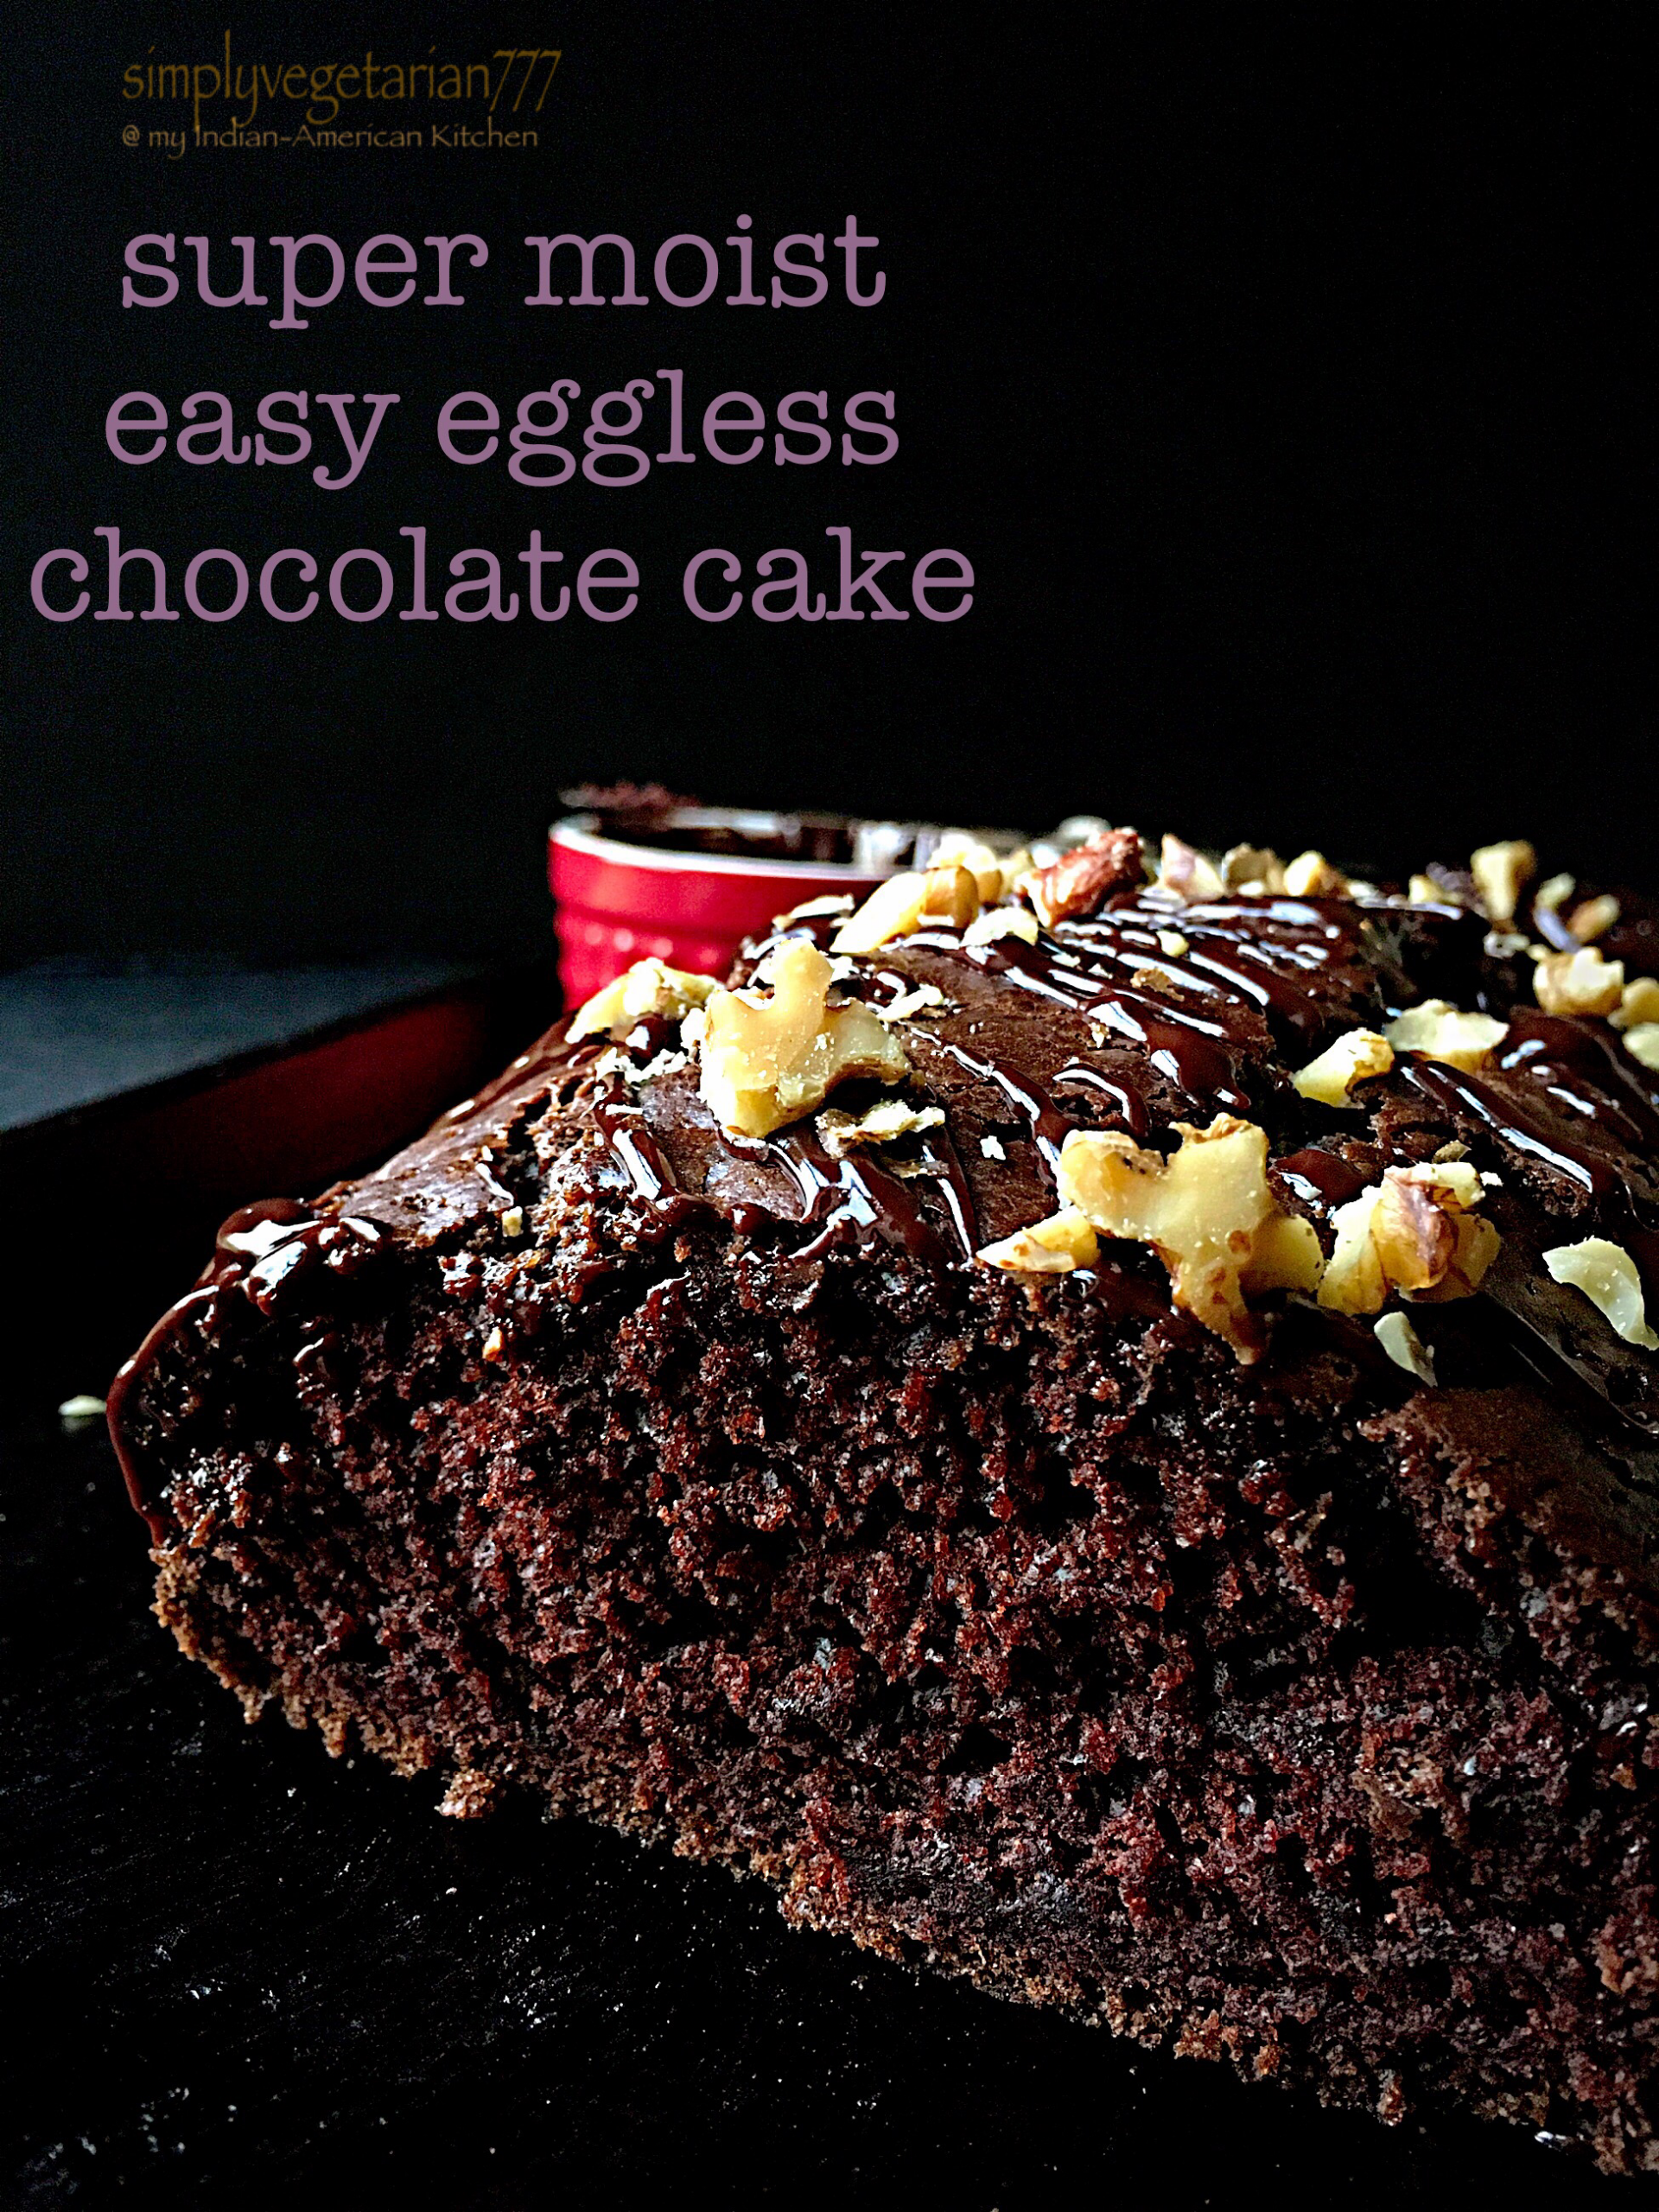 Super Moist Easy Eggless Chocolate Cake